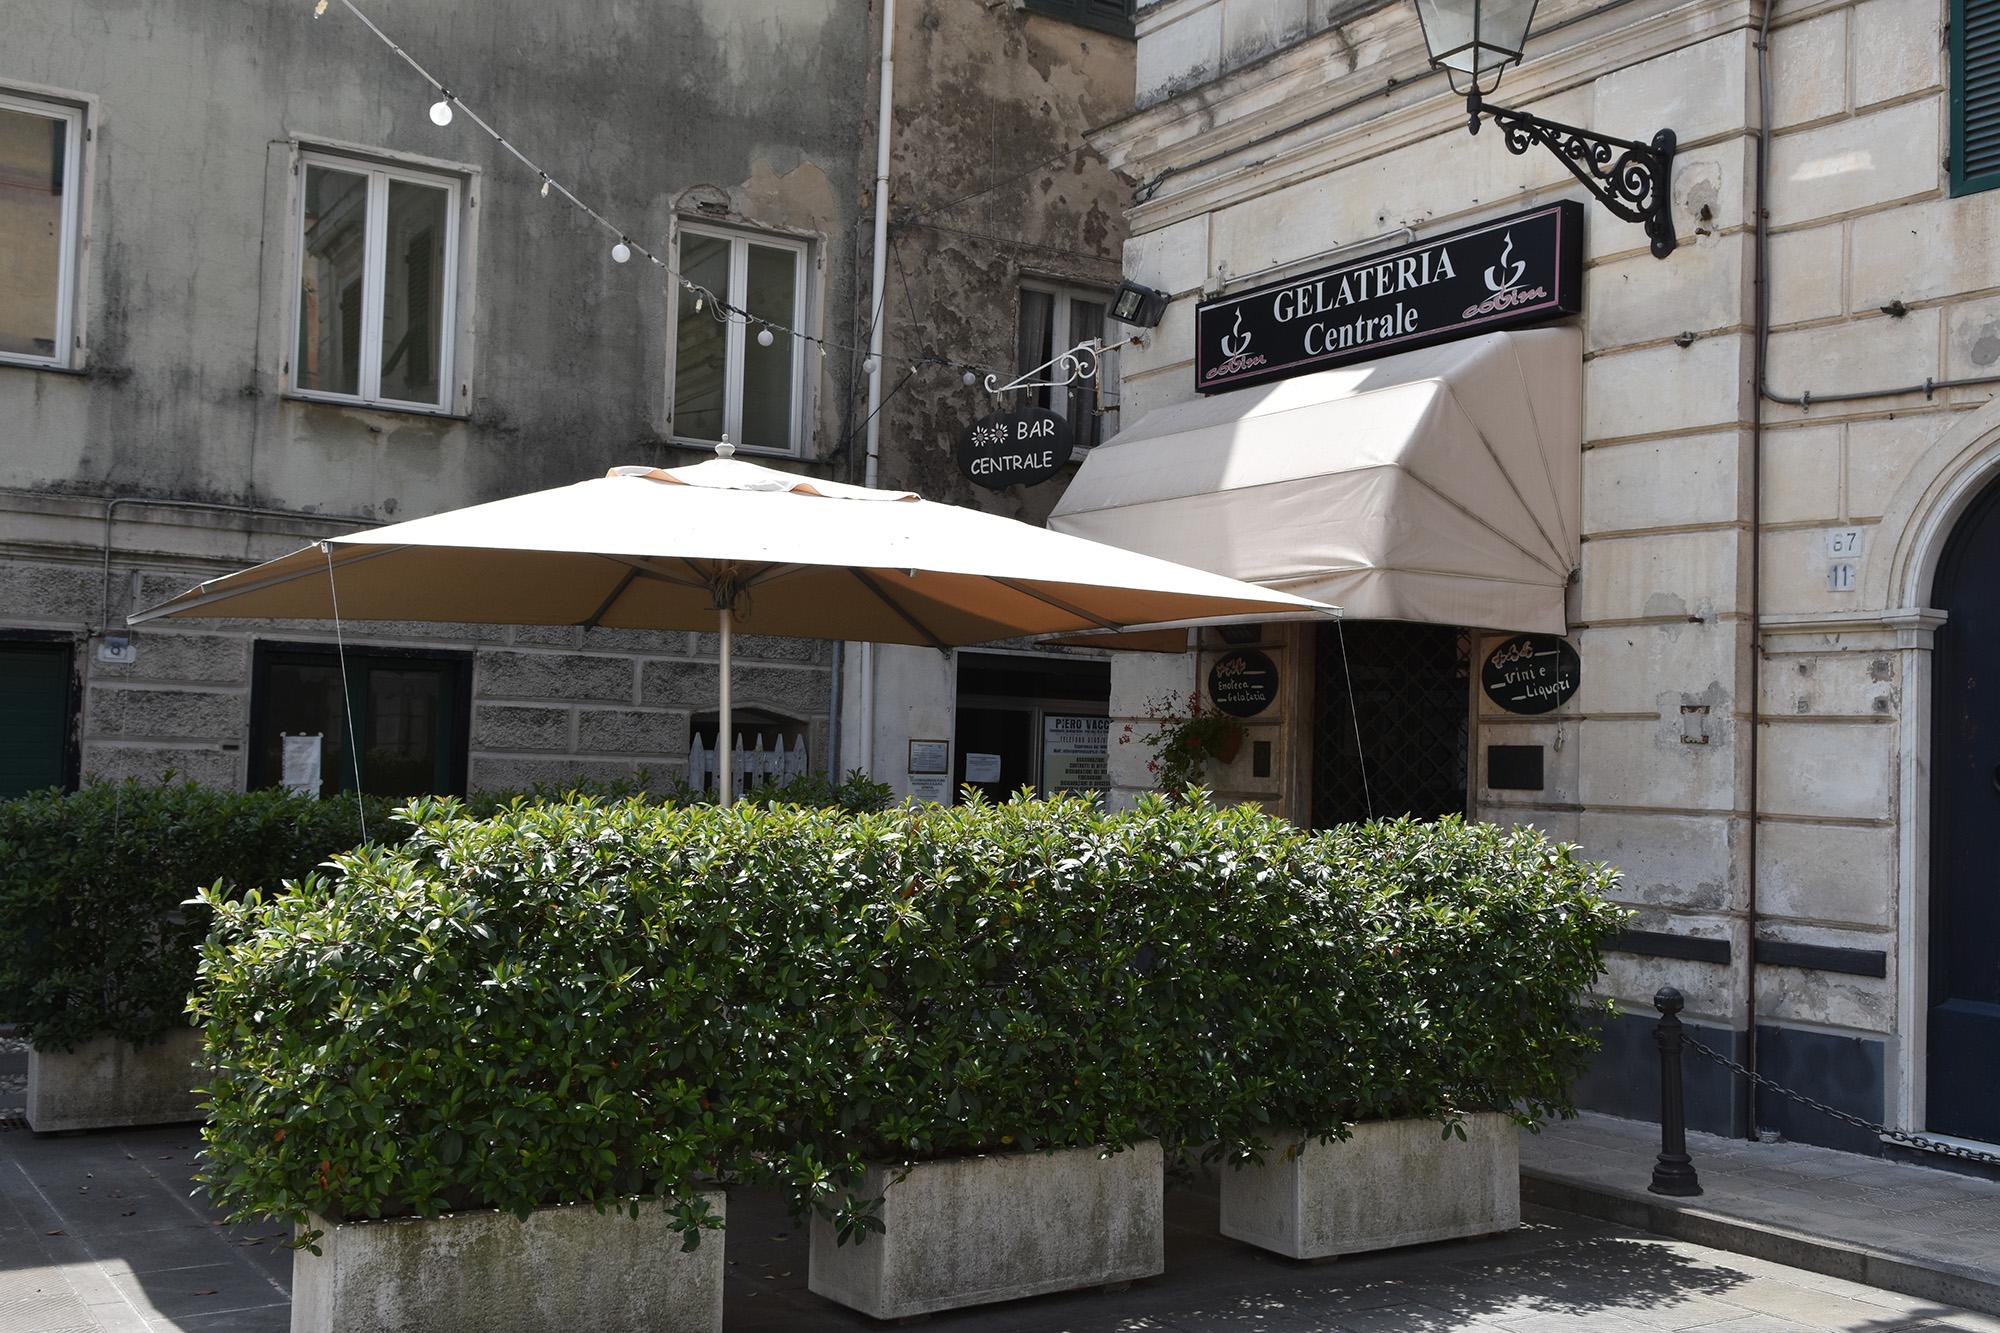 Bar gelateria Centrale